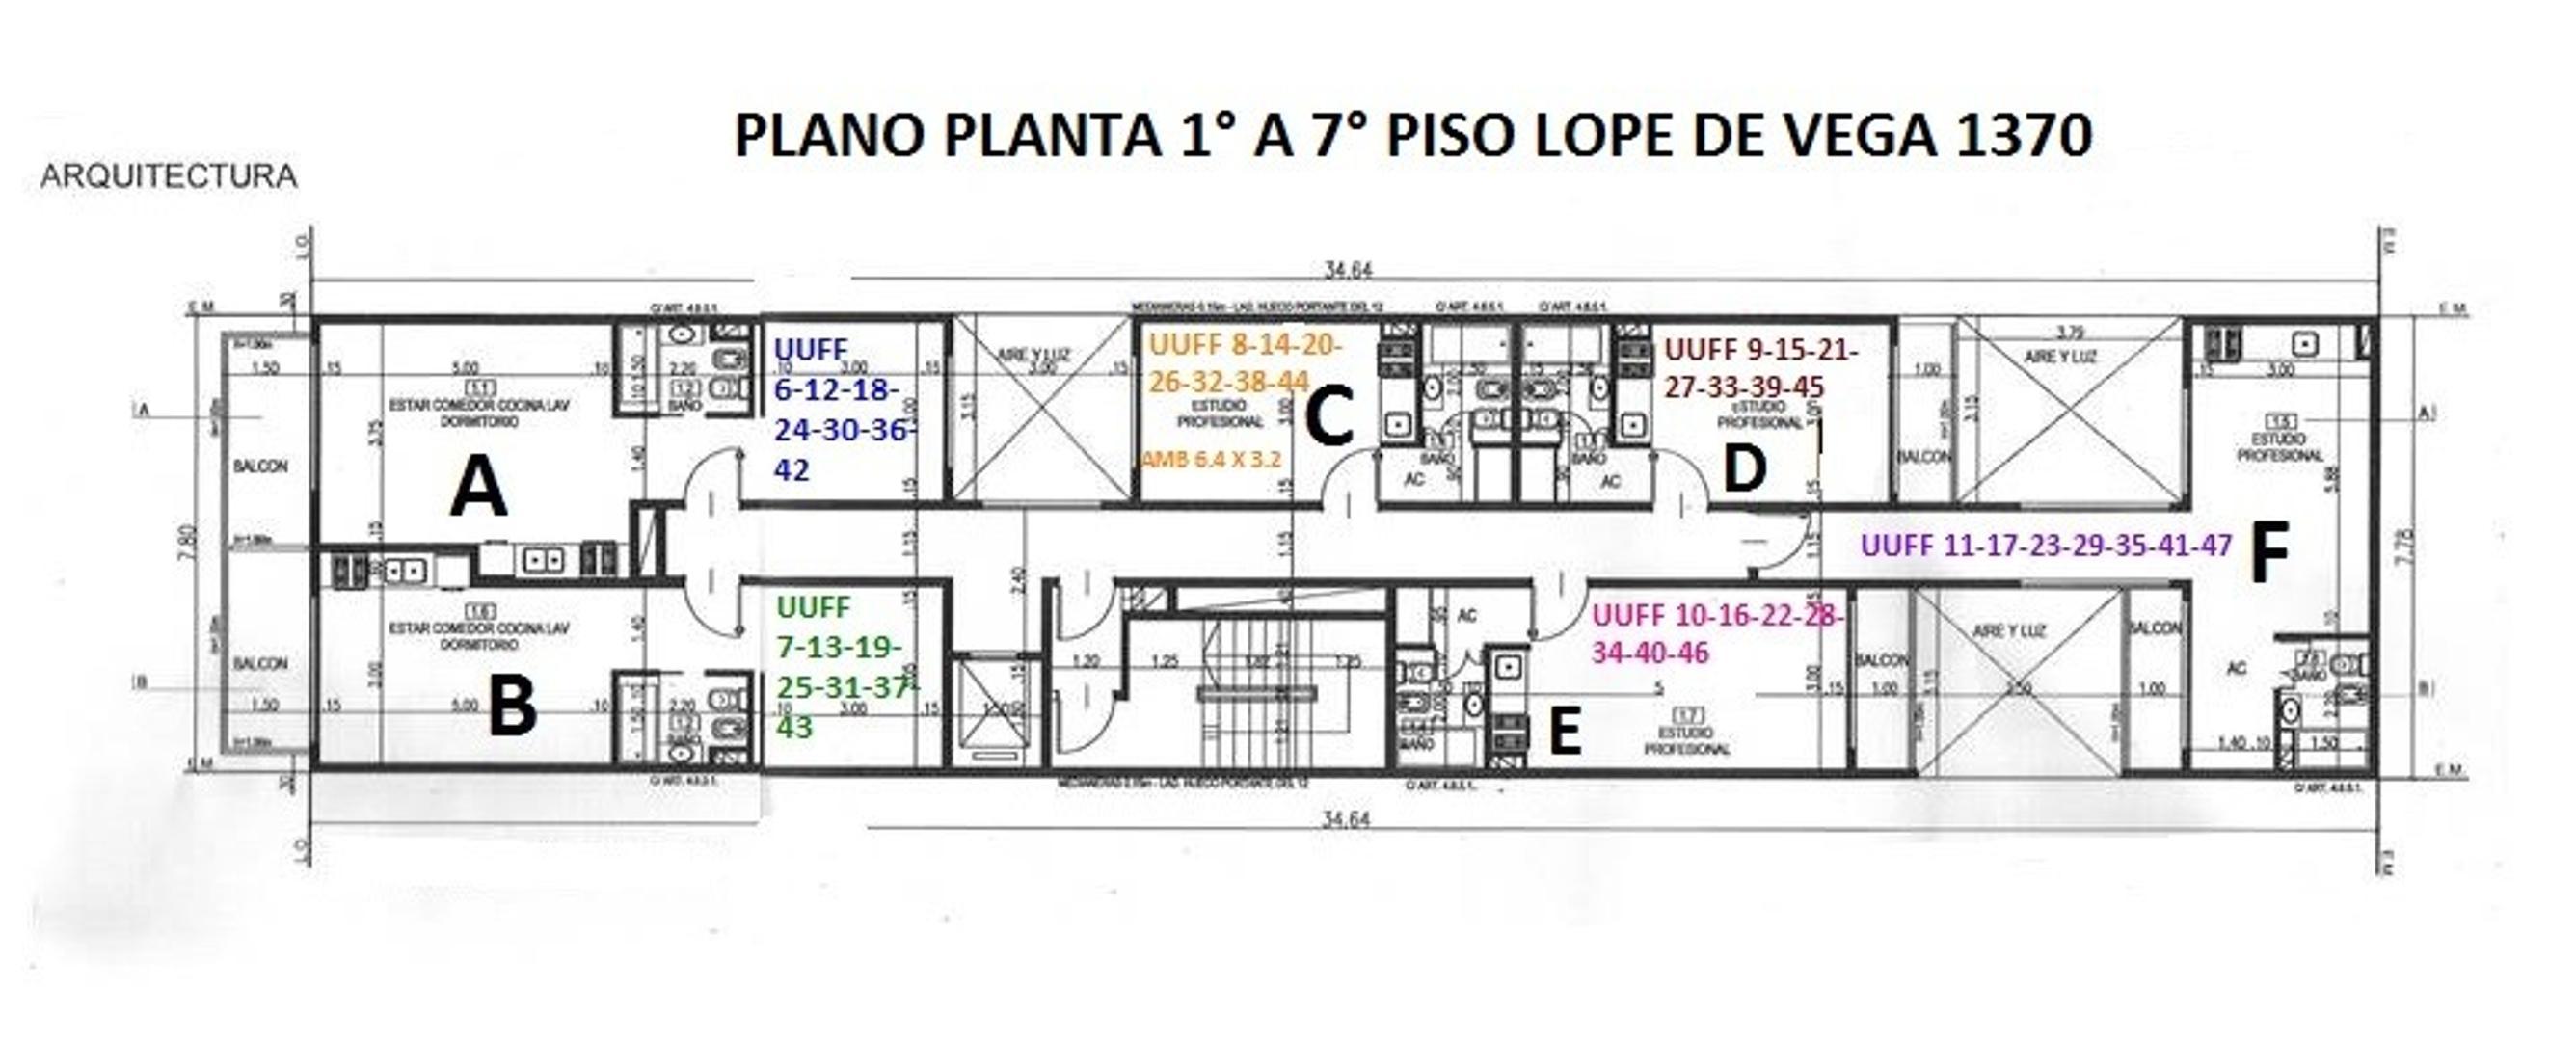 XINTEL(NIR-NIR-1024) Departamento - Venta - Argentina, Capital Federal - AV. LOPE DE VEGA  AL 1300